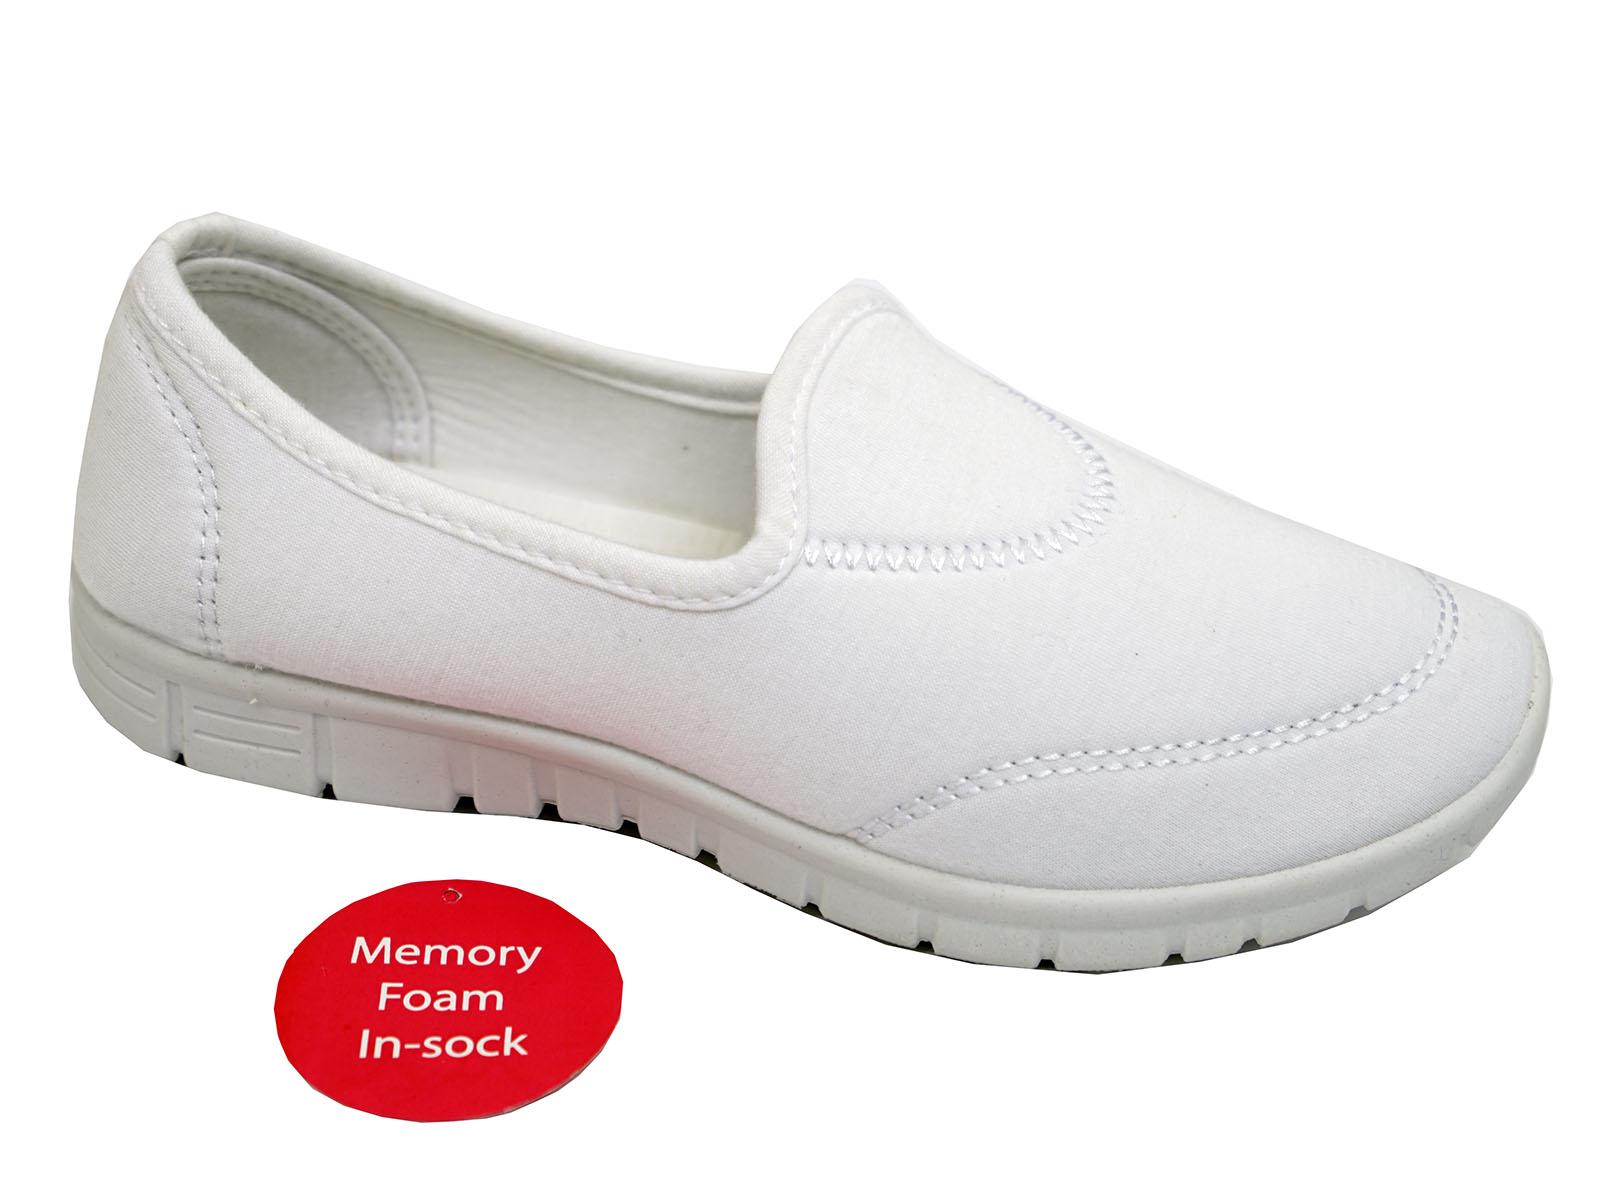 Damen weiß zum reinschlüpfen Memory Foam Komfort Wandern Trainer Pumps Schuhe UK